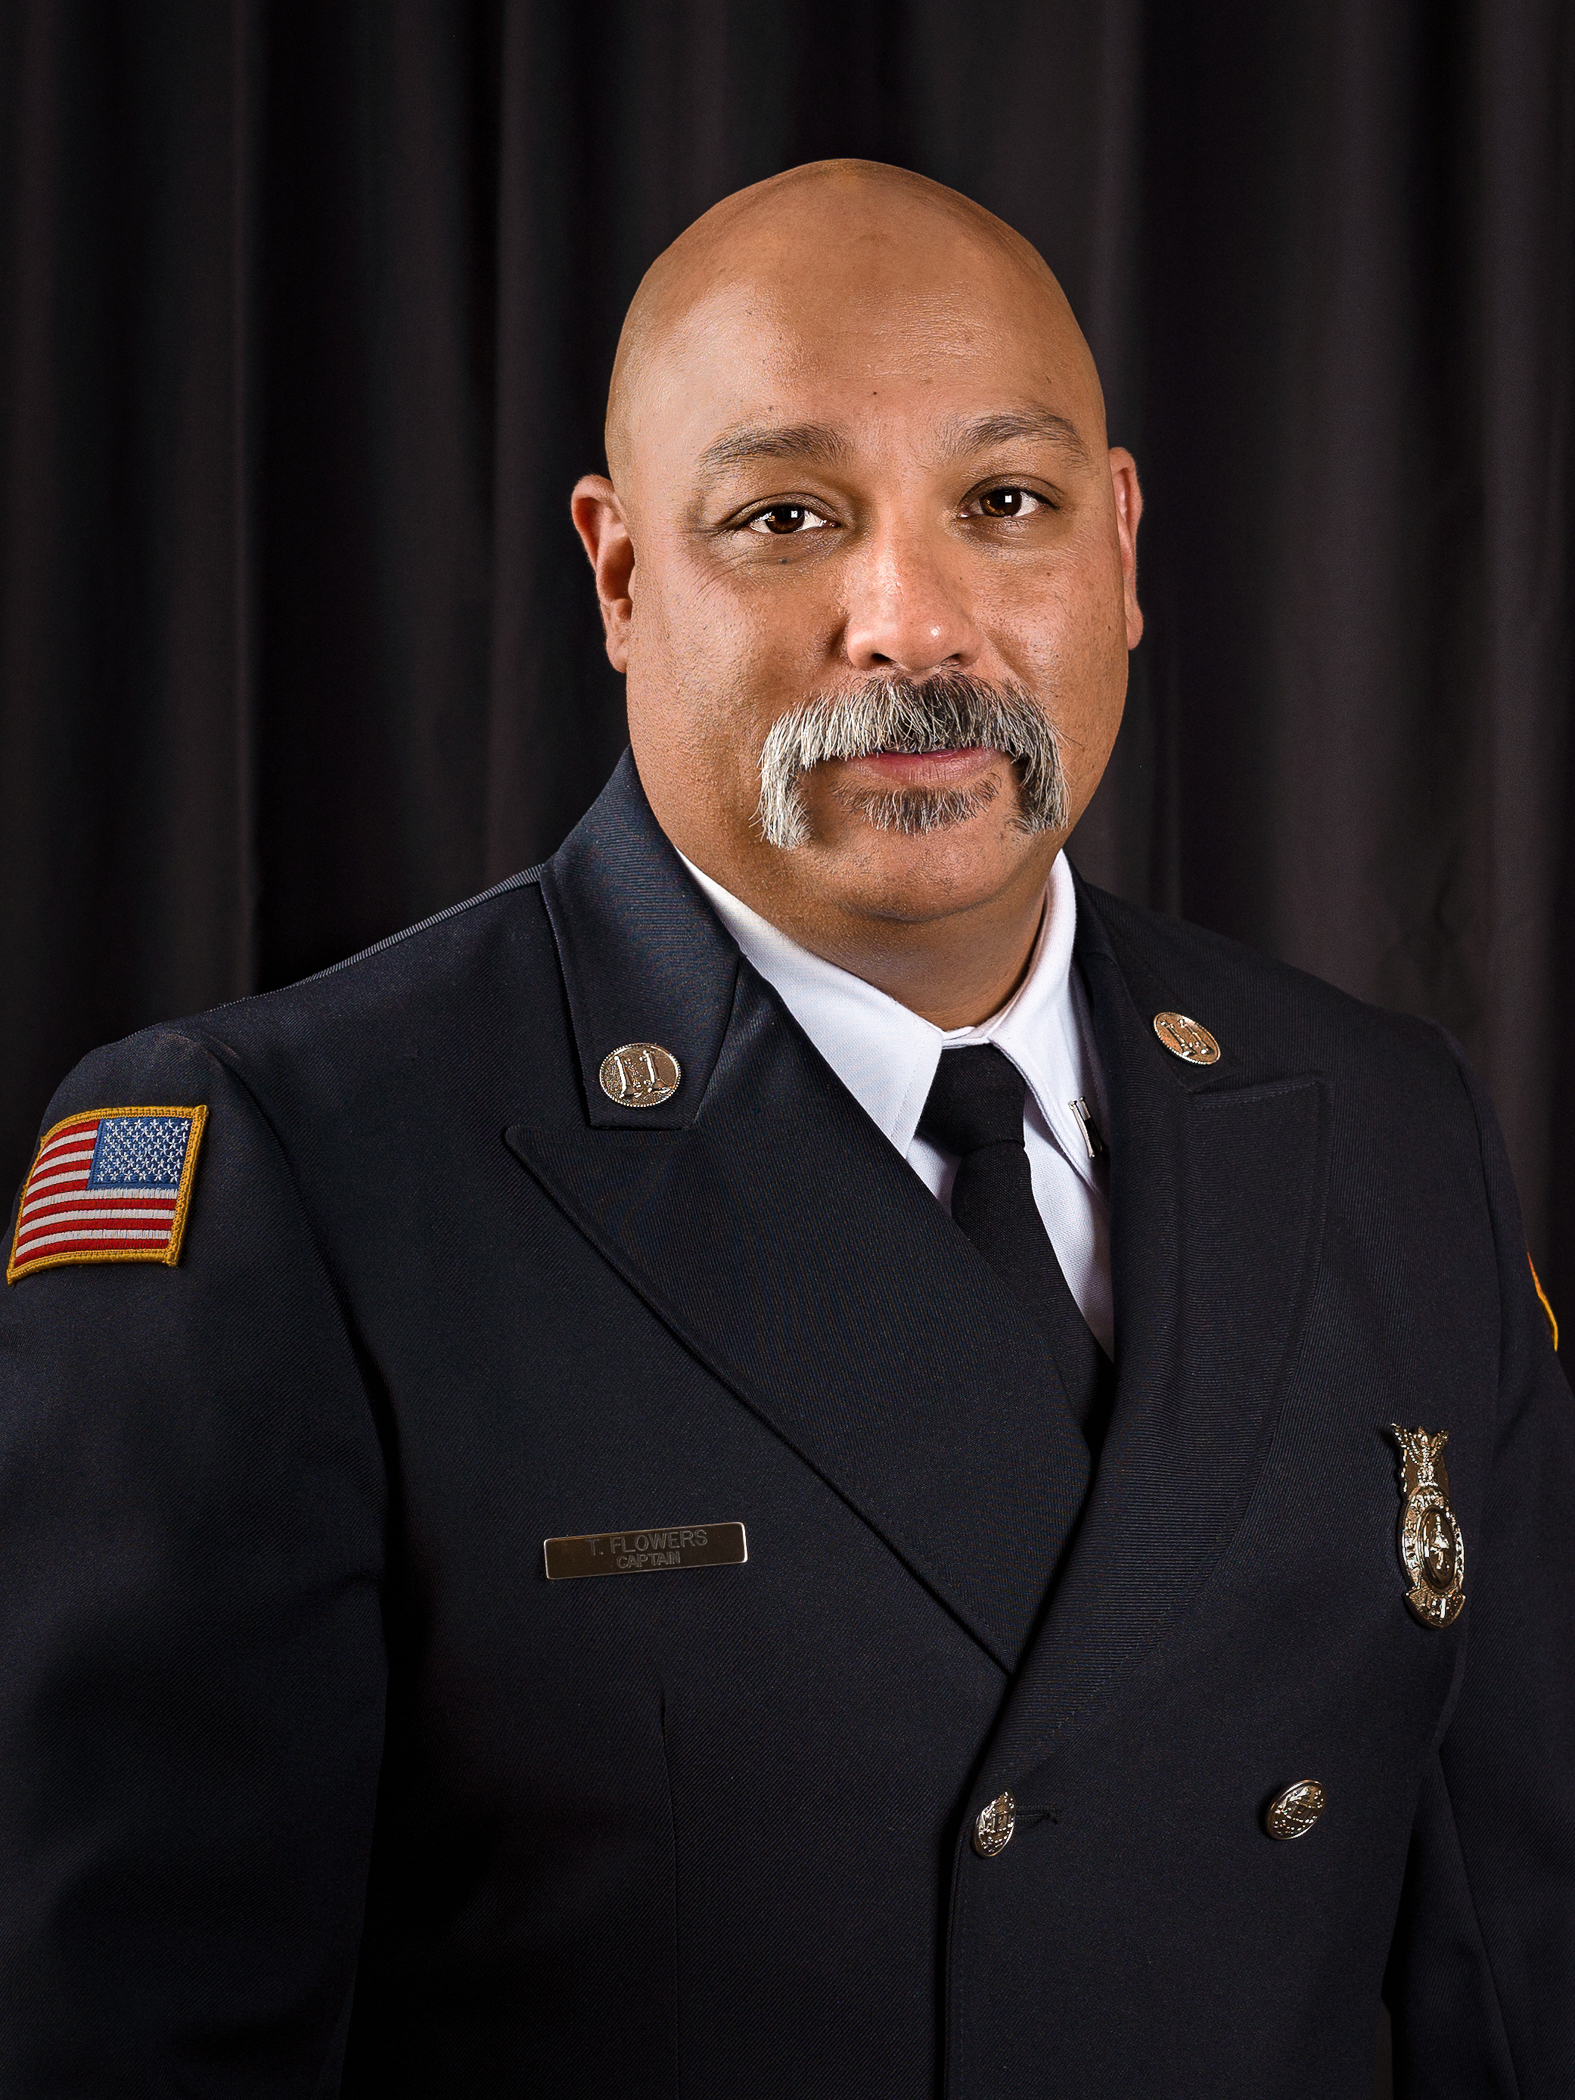 Captain Tony Flowers, Schriever A.F.B. Fire Emergency Services